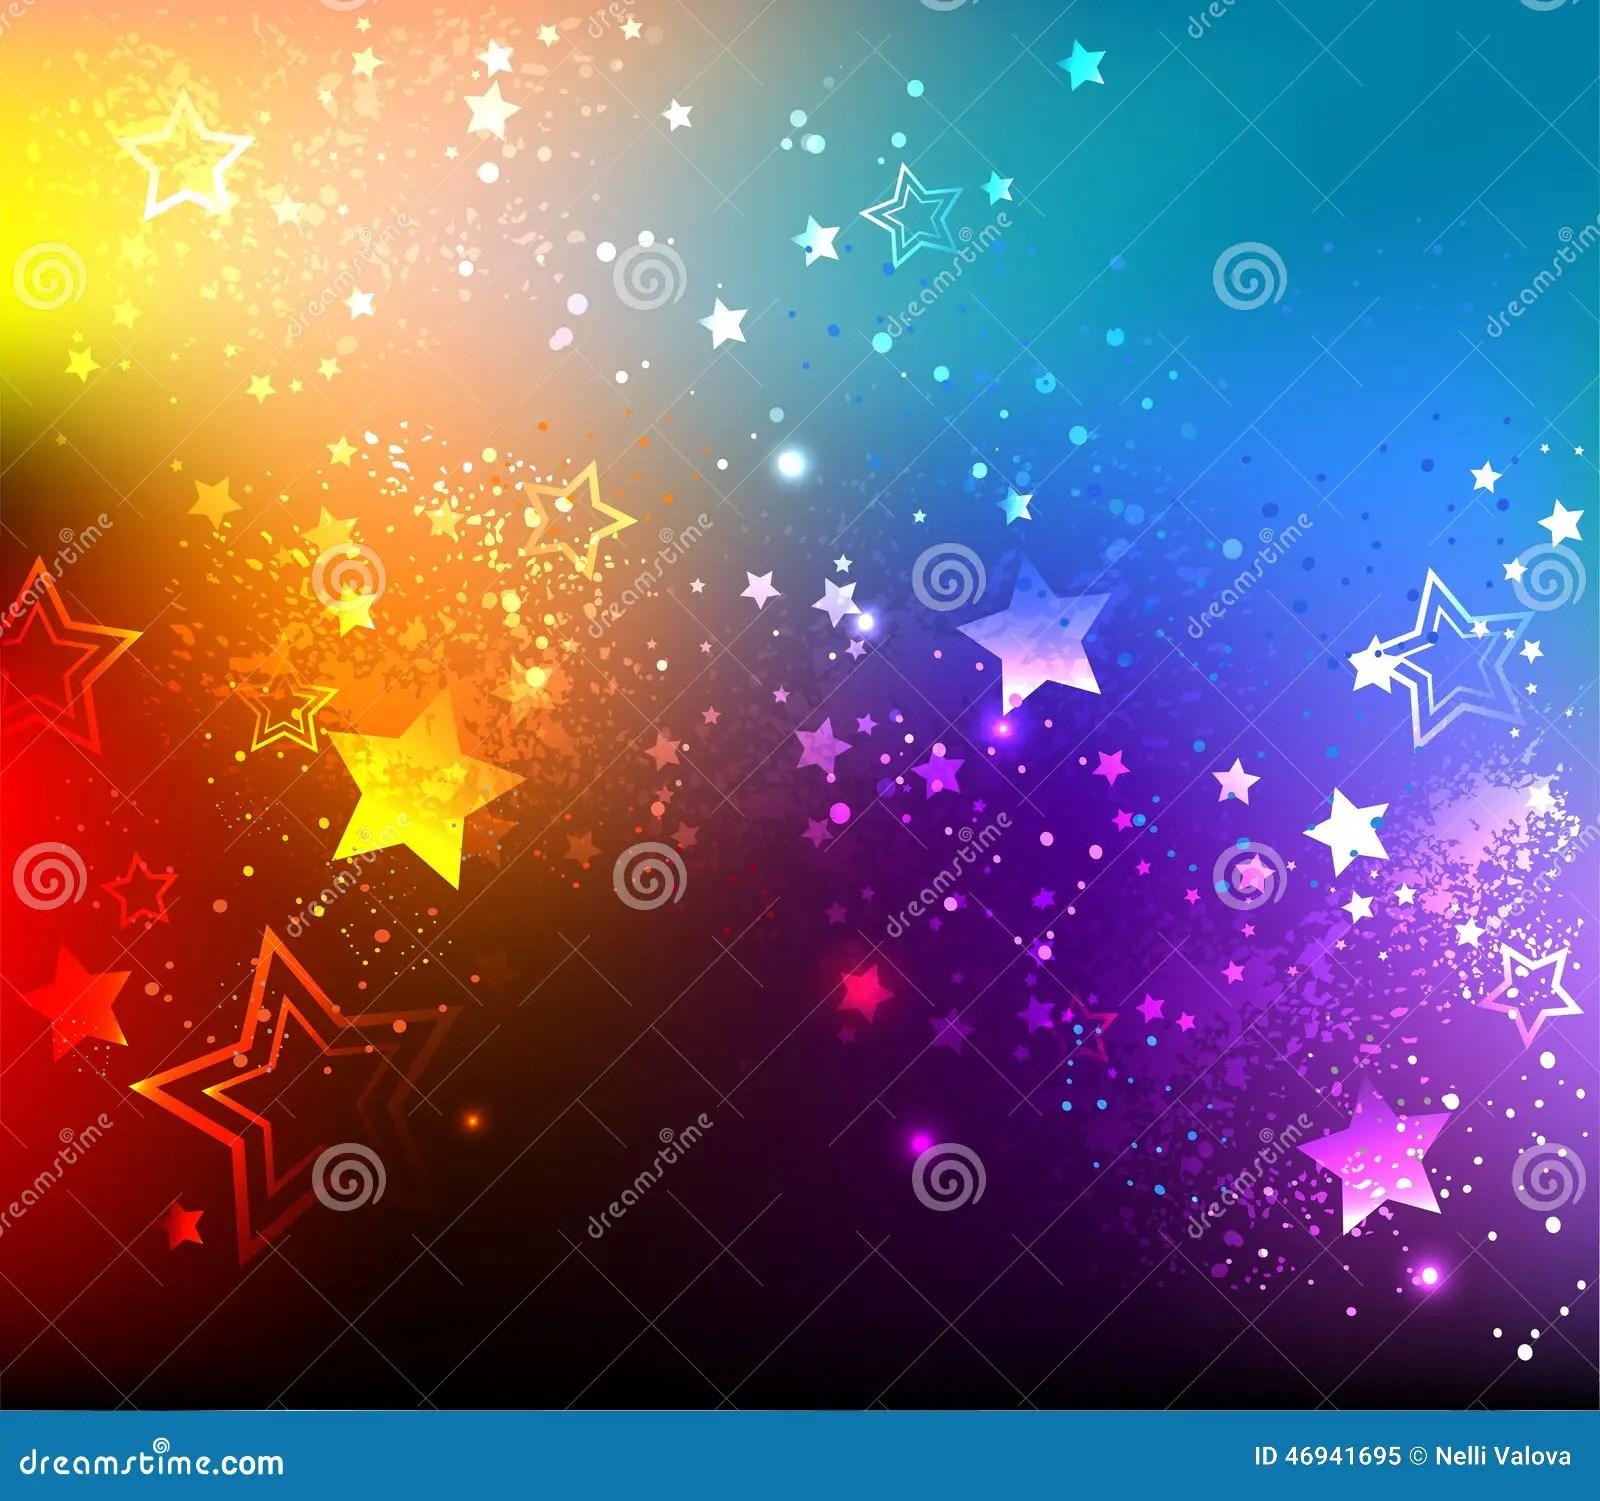 Rainbow Background With Stars Stock Photo Image 46941695